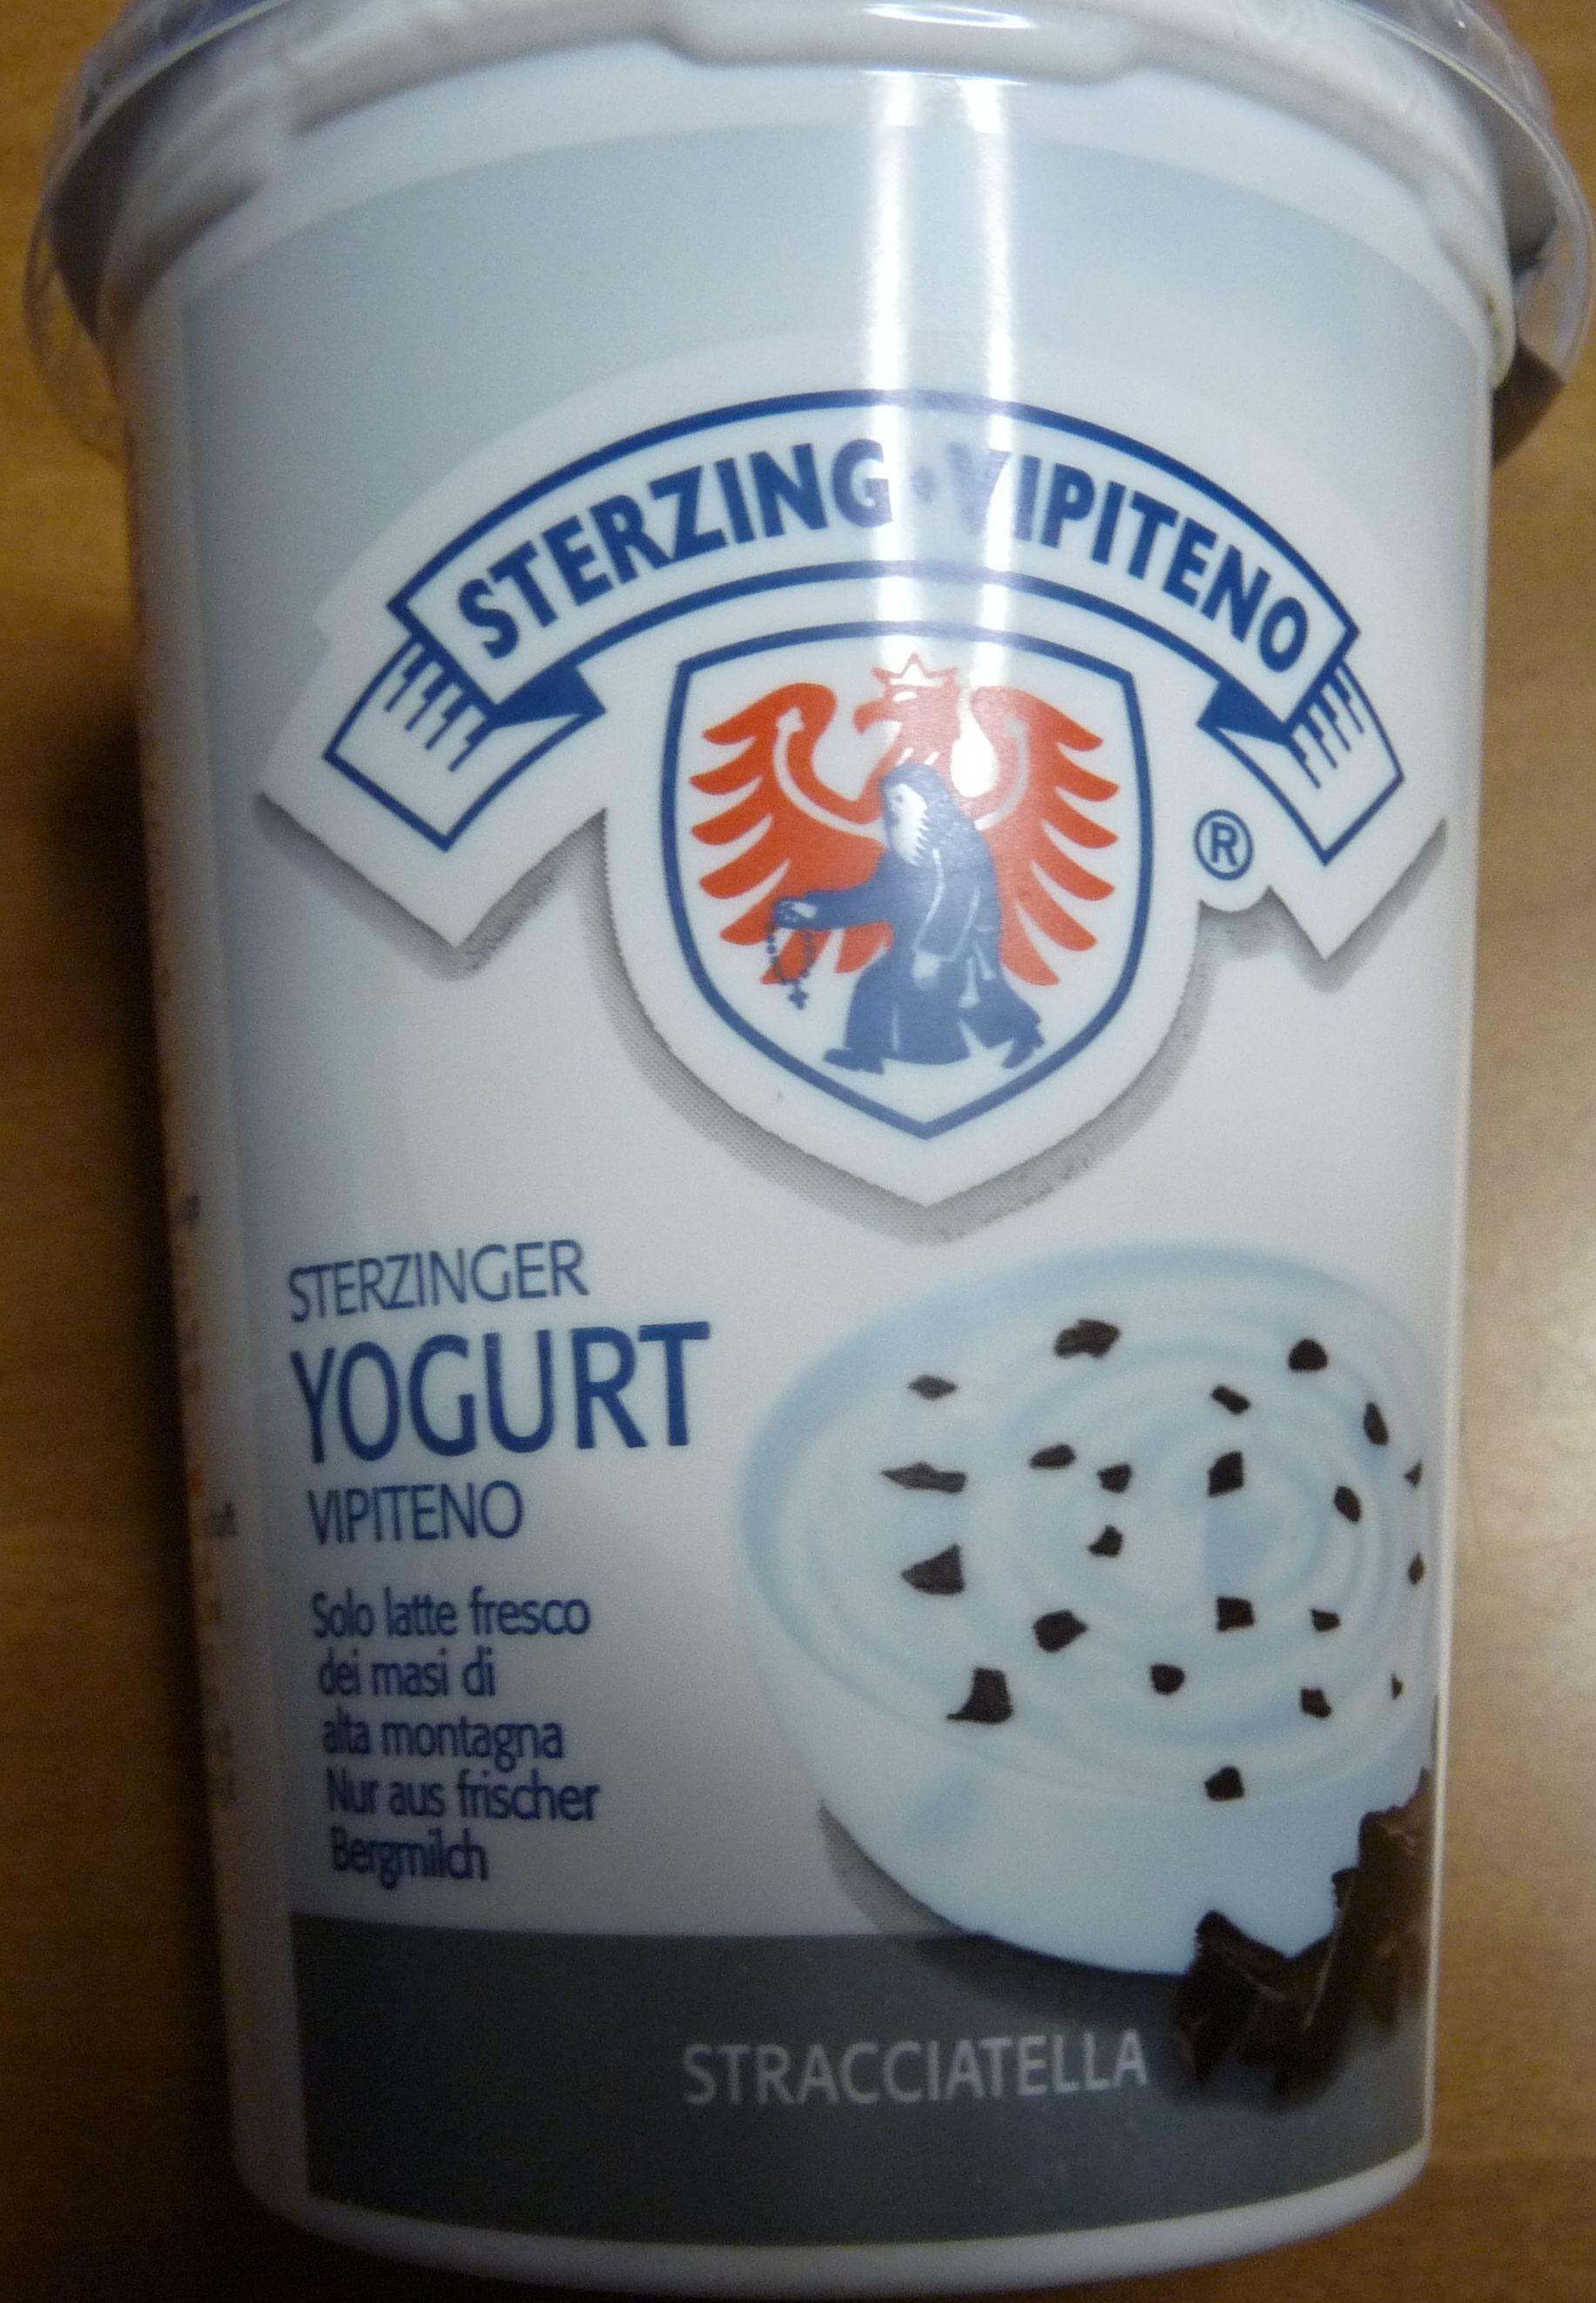 YOGURT Vipiteno Yogurt cremoso di montagna - Product